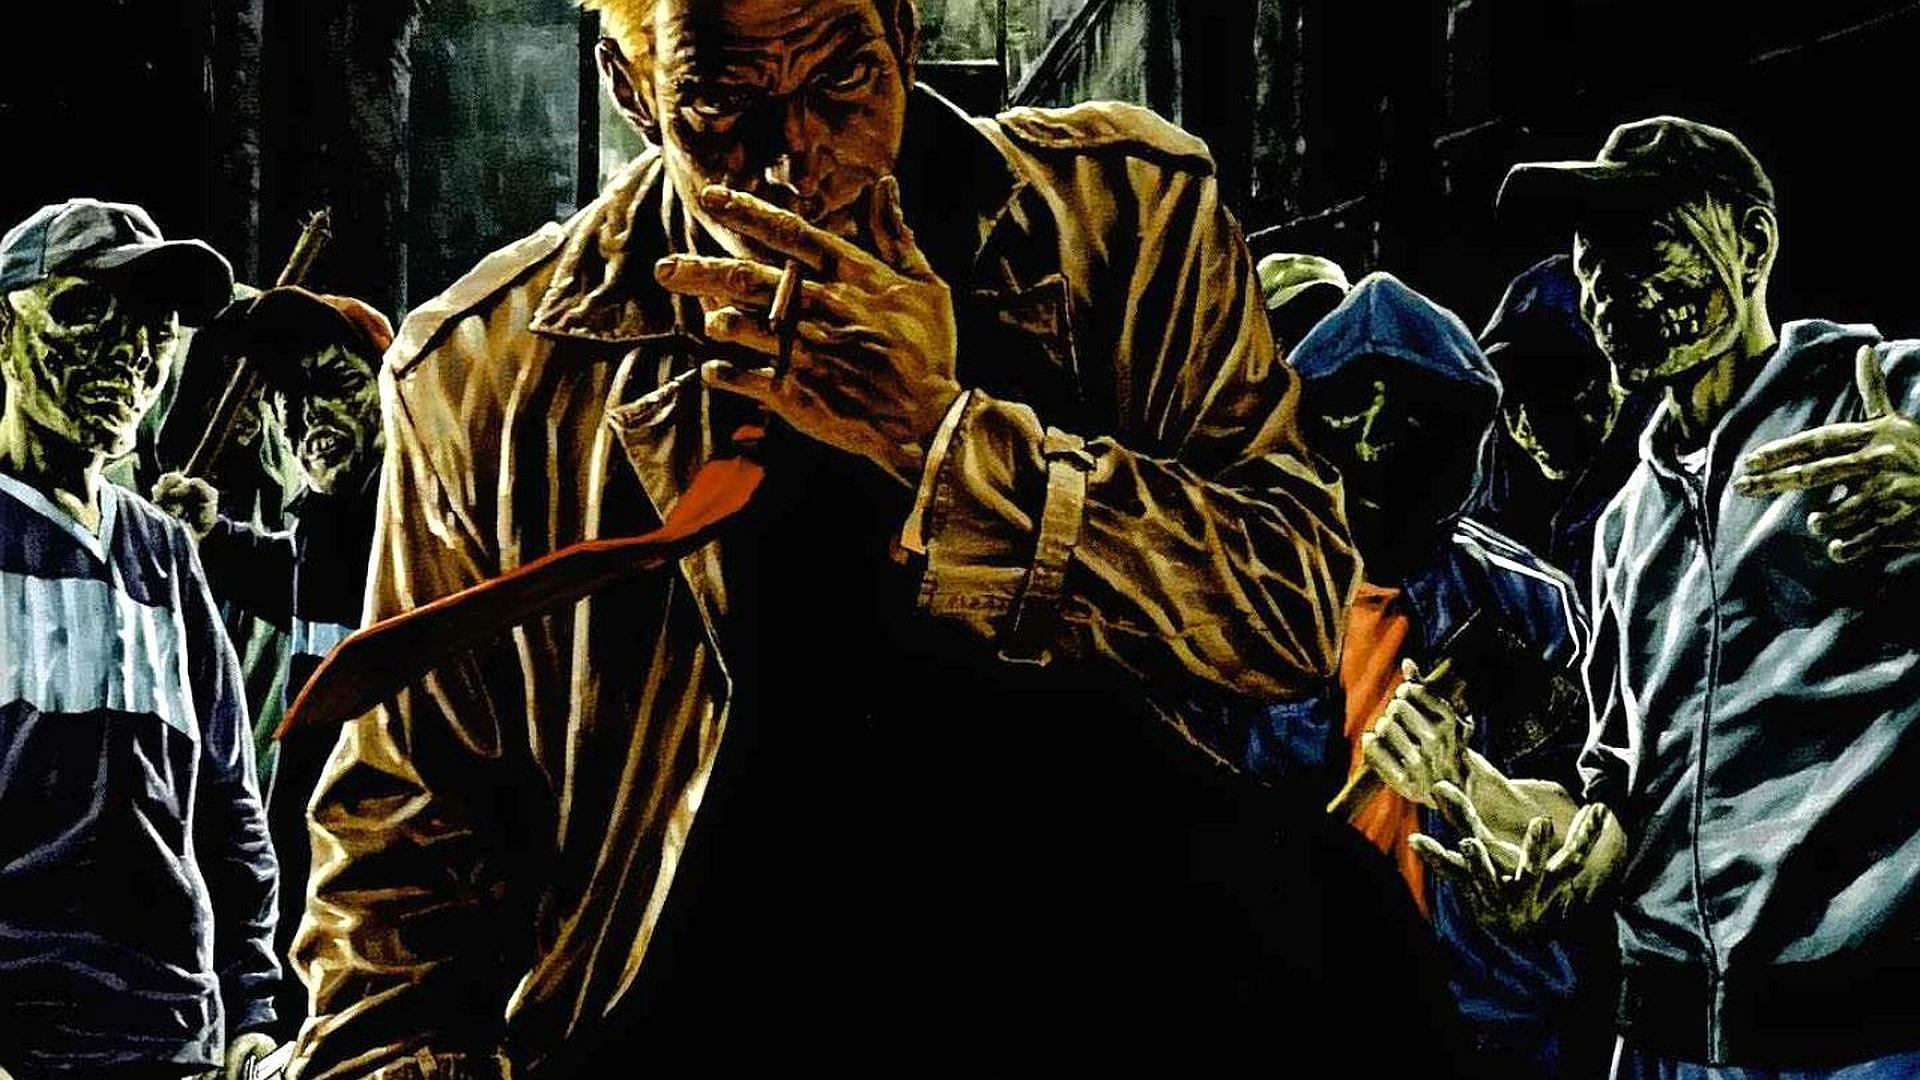 Simple Wallpaper Movie Vertigo - Vertigo-comics-screenshot-comic-book-john-constantine-hellblazer-yorick-brown-y-the-last-man-580007  Snapshot_845651.jpg